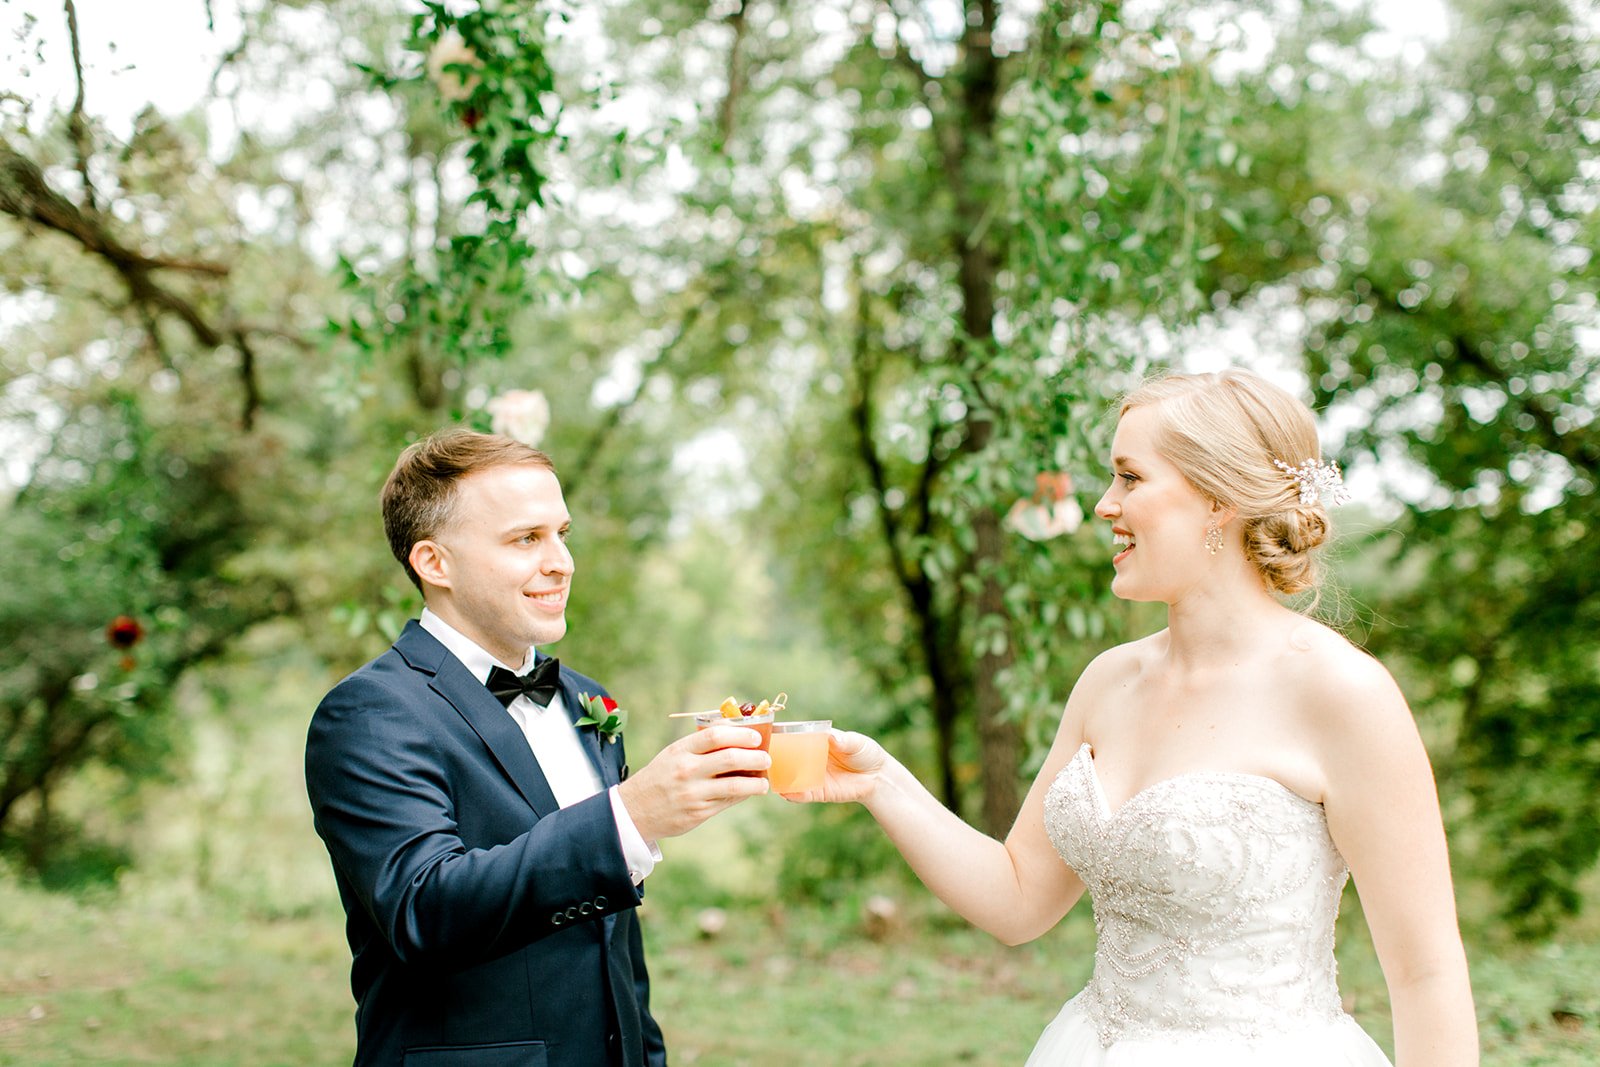 Bridge and groom holding drinks